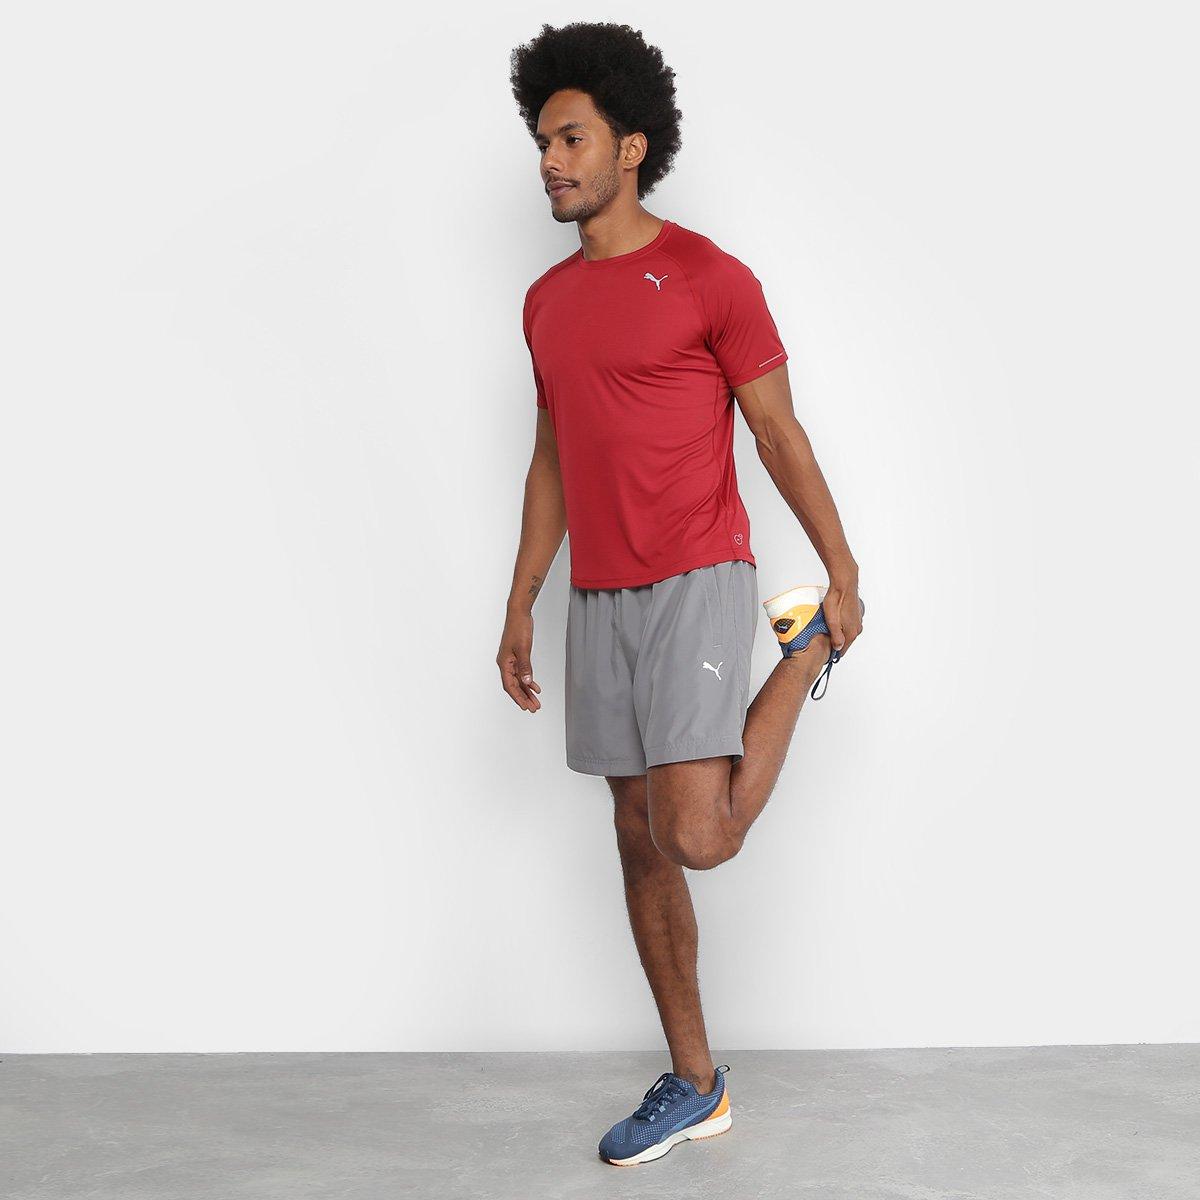 5df70e0ea5 Camiseta Puma Core-Run Masculina - Compre Agora